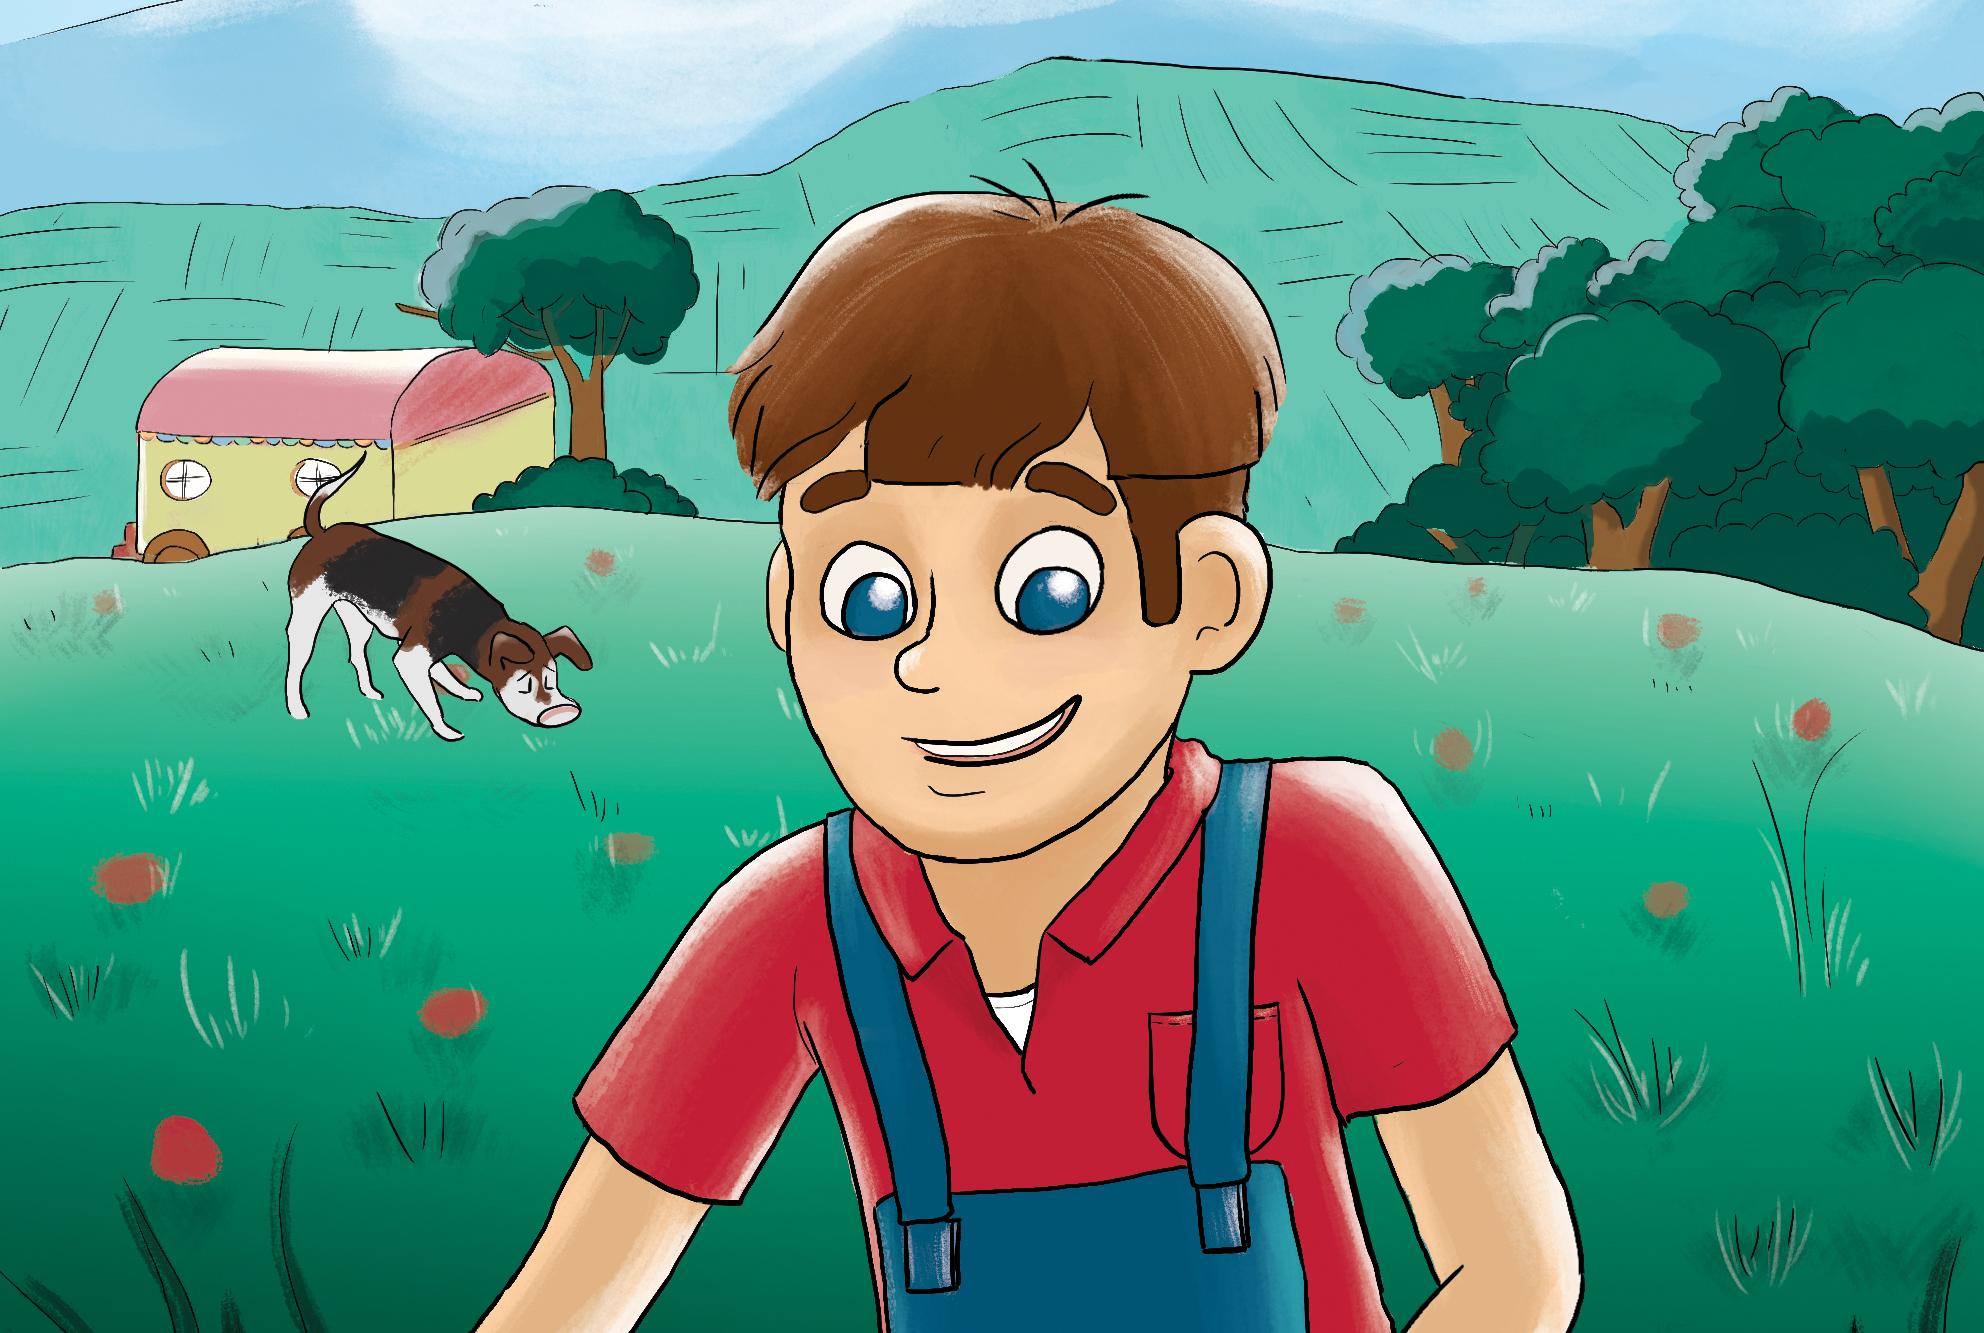 Illustrations – Gino et la chasse aux niglos